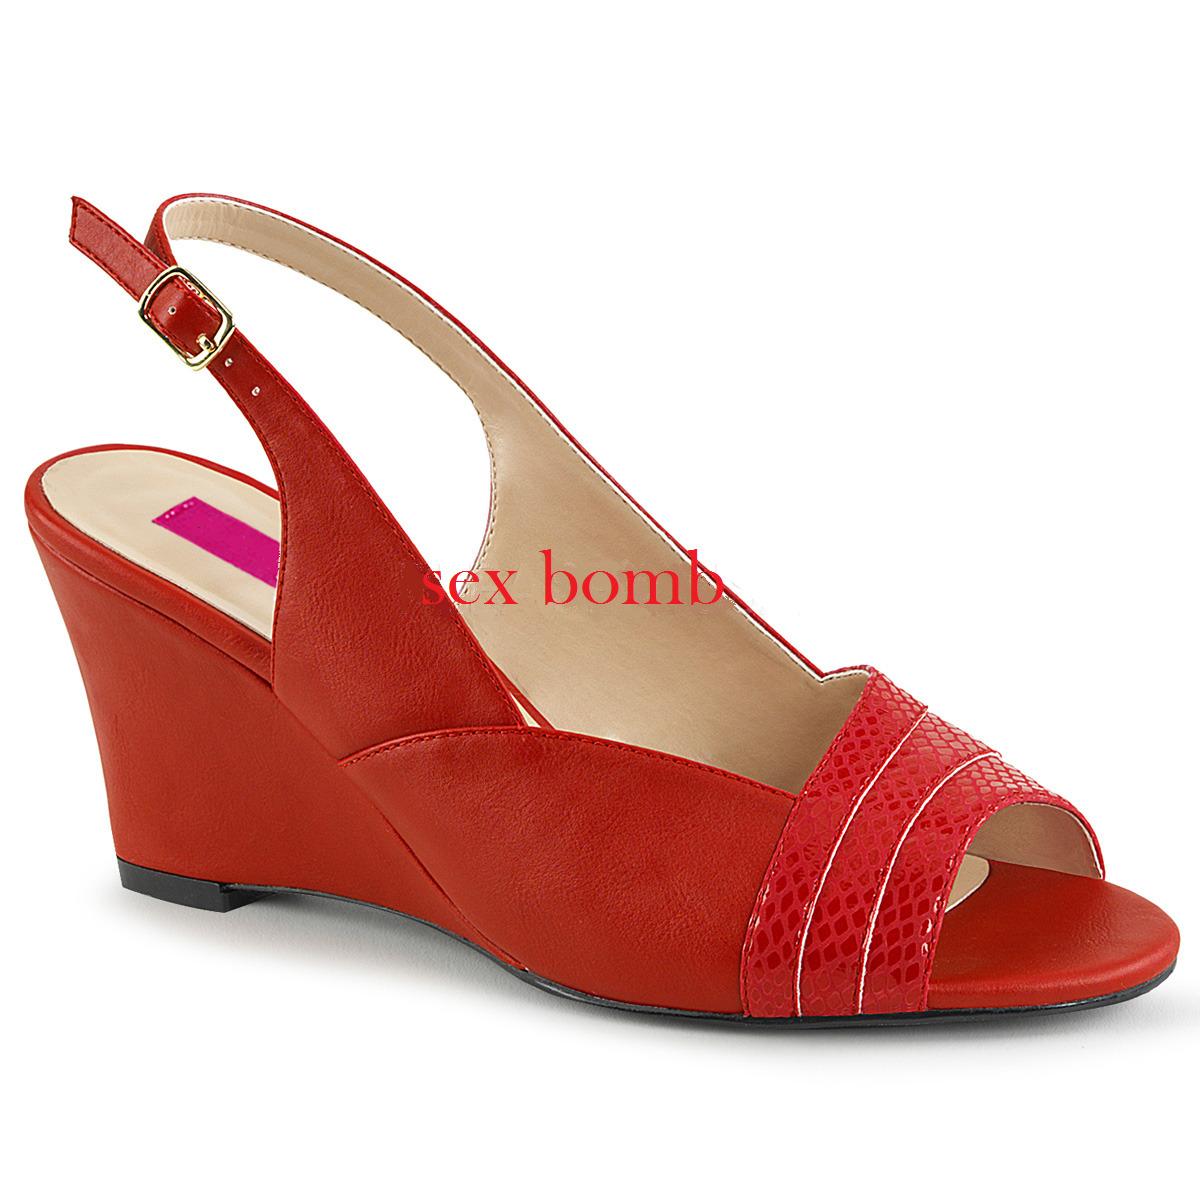 SANDALI tacco 7,5 ZEPPA dal 39 al 46 ROSSO OPACO cinturino scarpe SEXY glamour